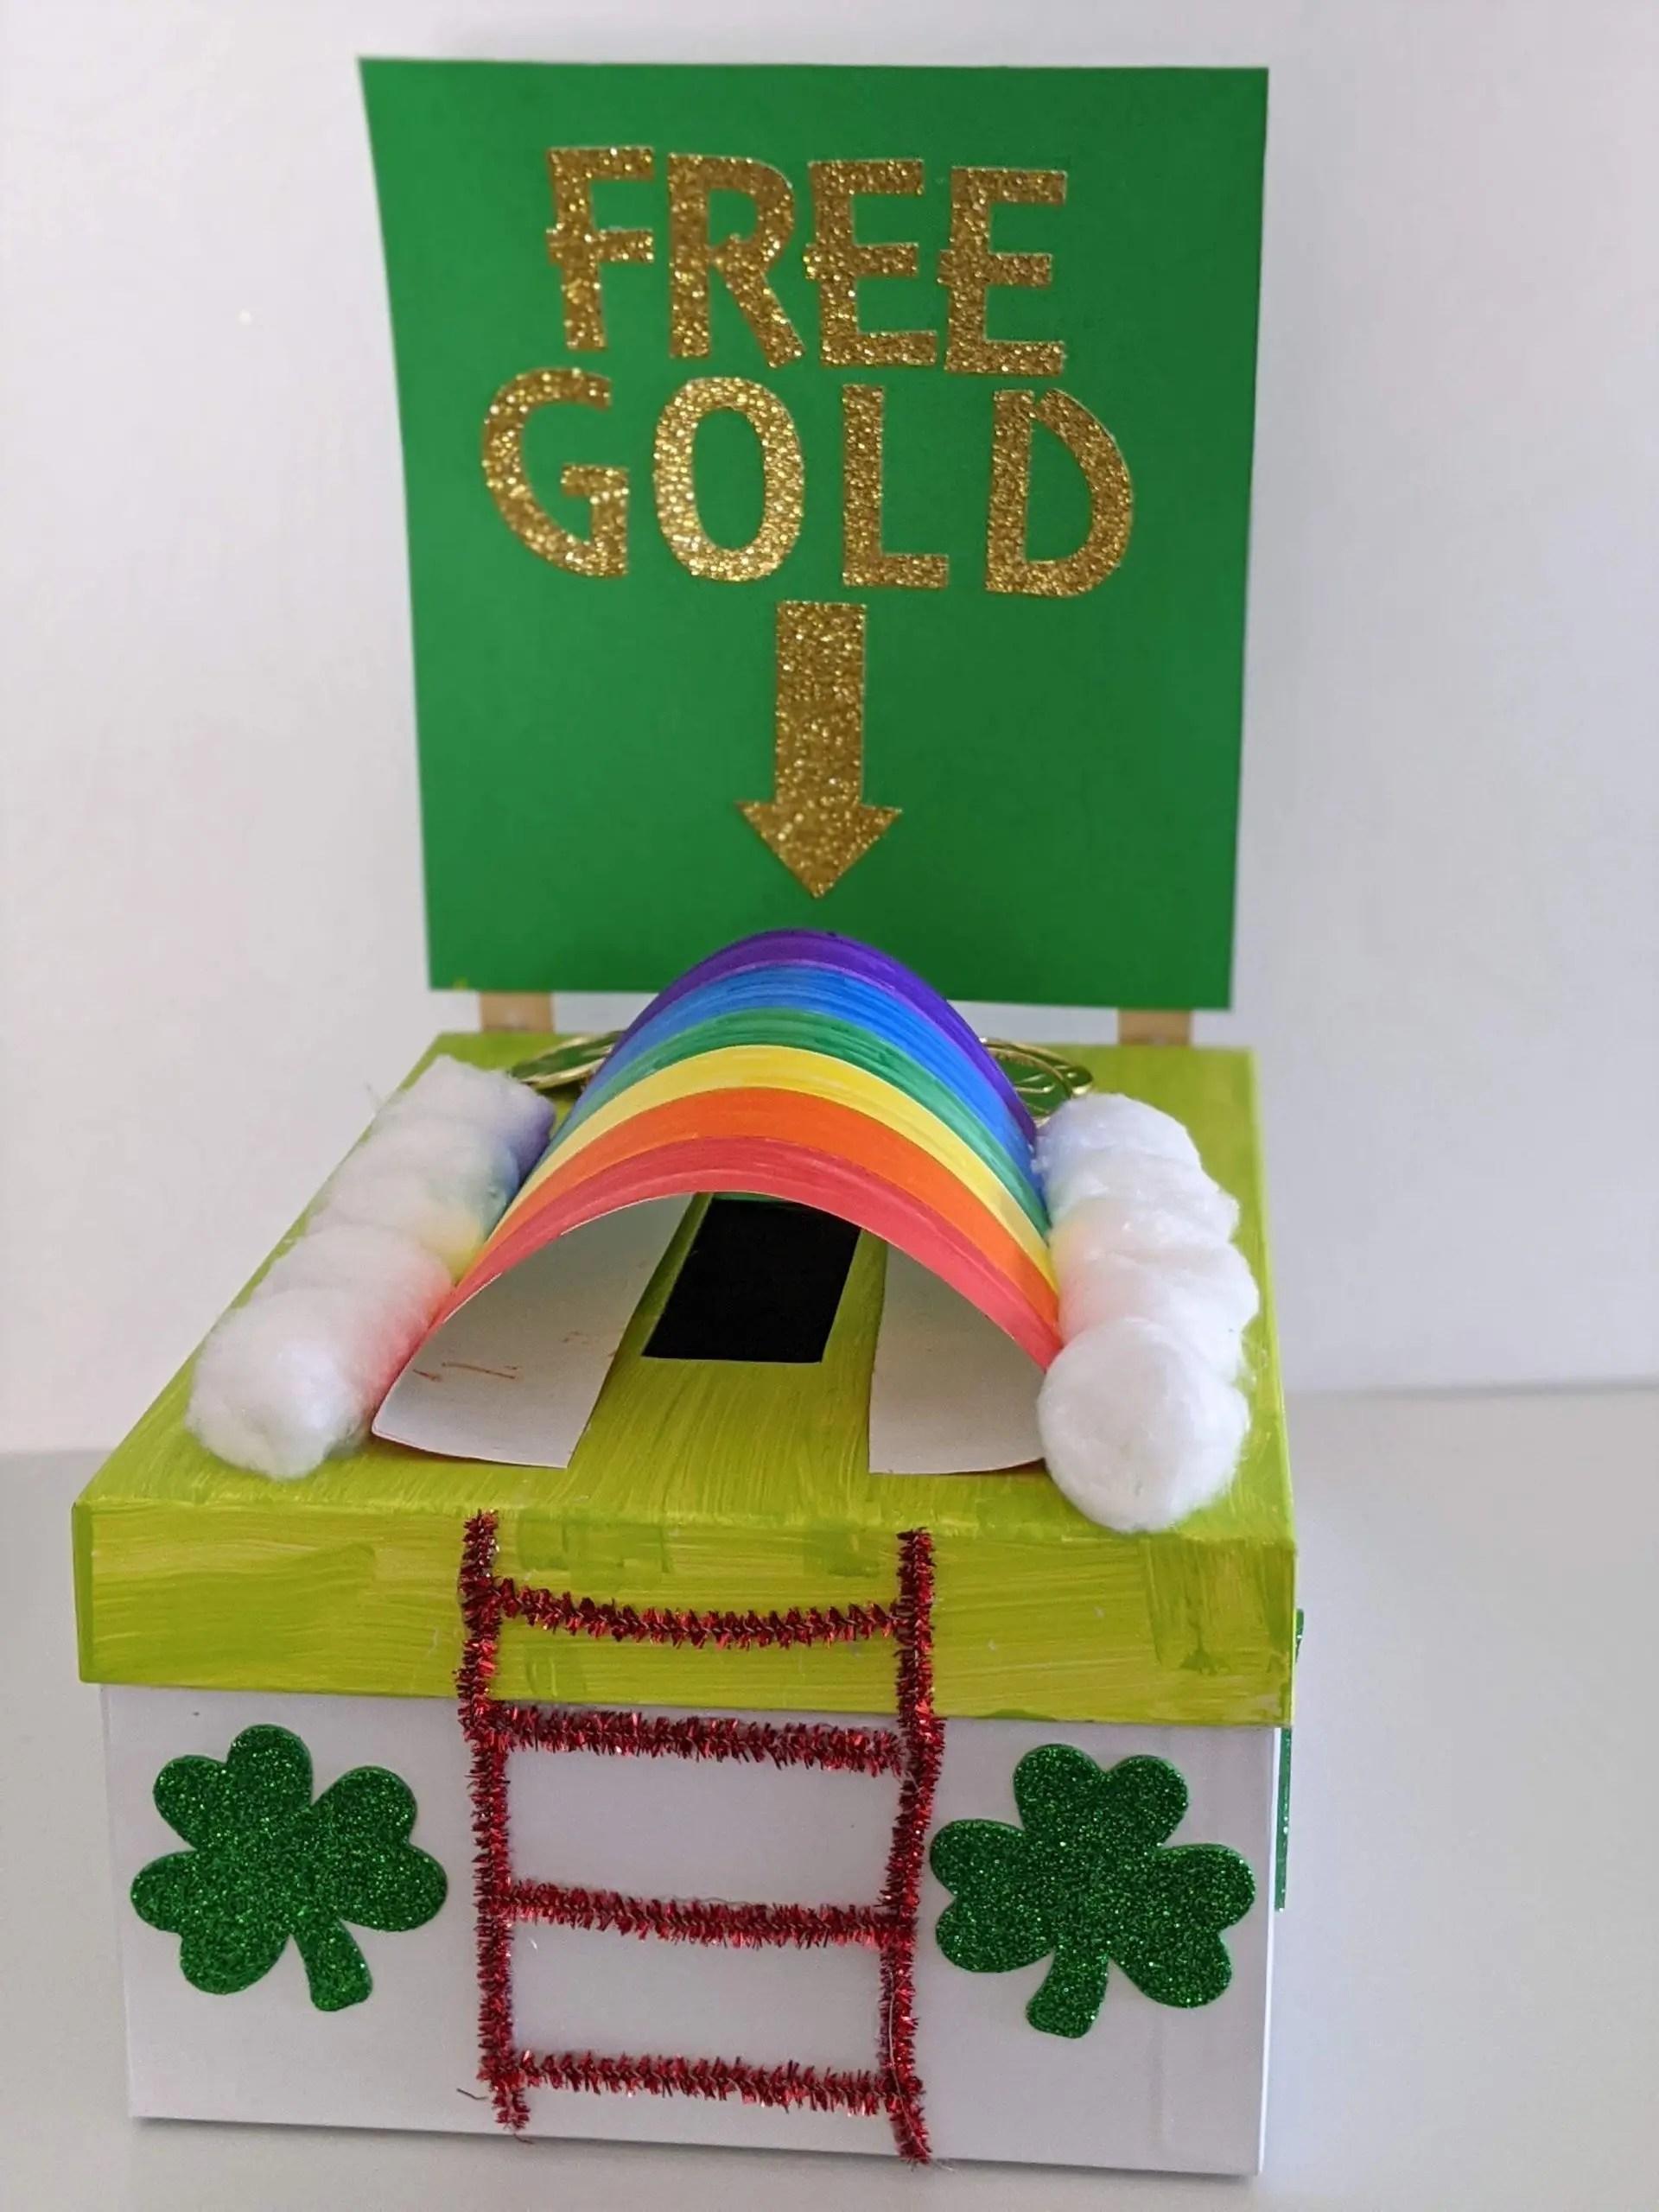 DIY leprechaun trap made out of shoe box